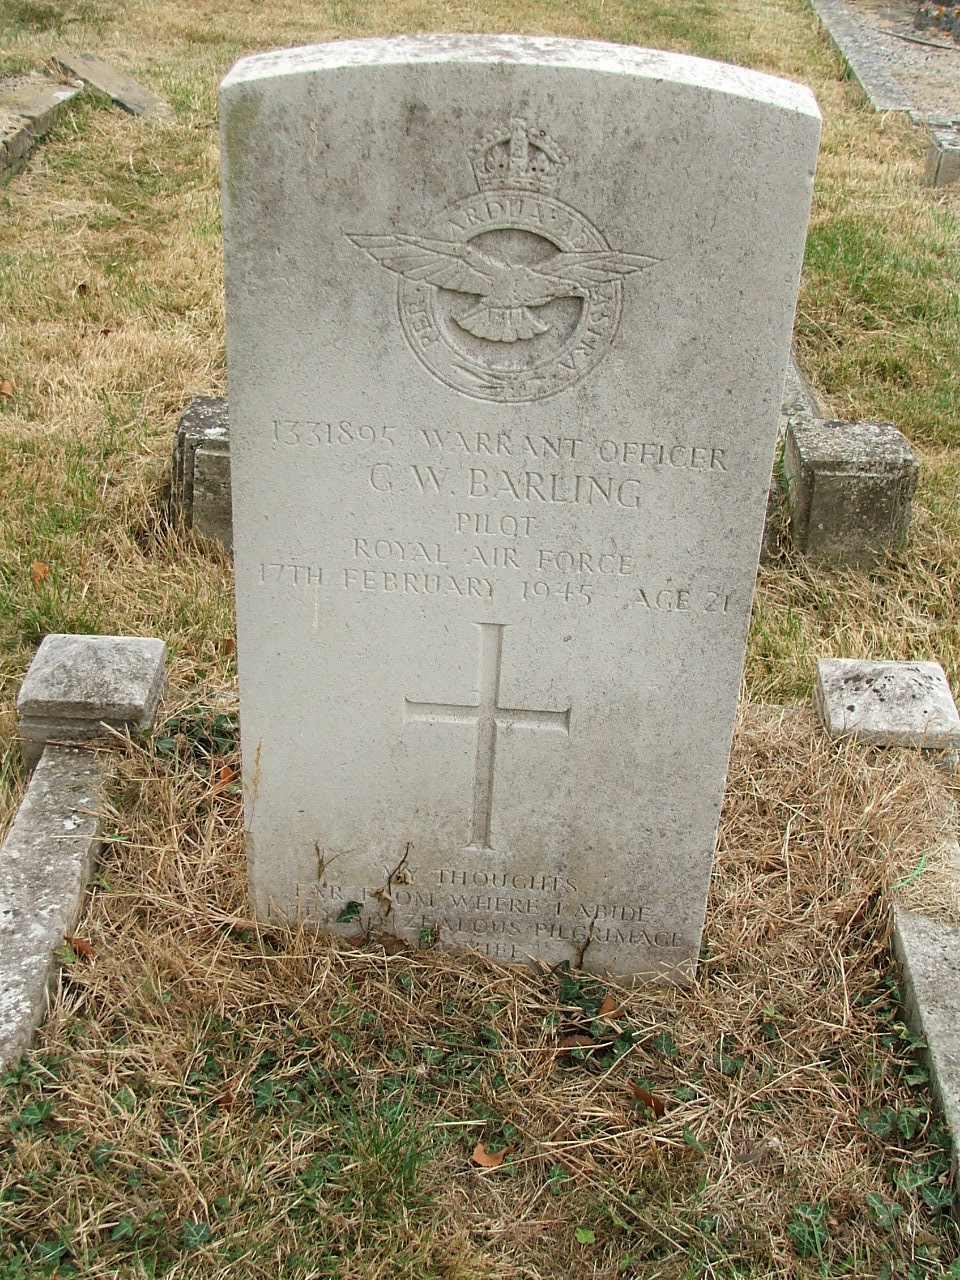 WO Grahame William Barling